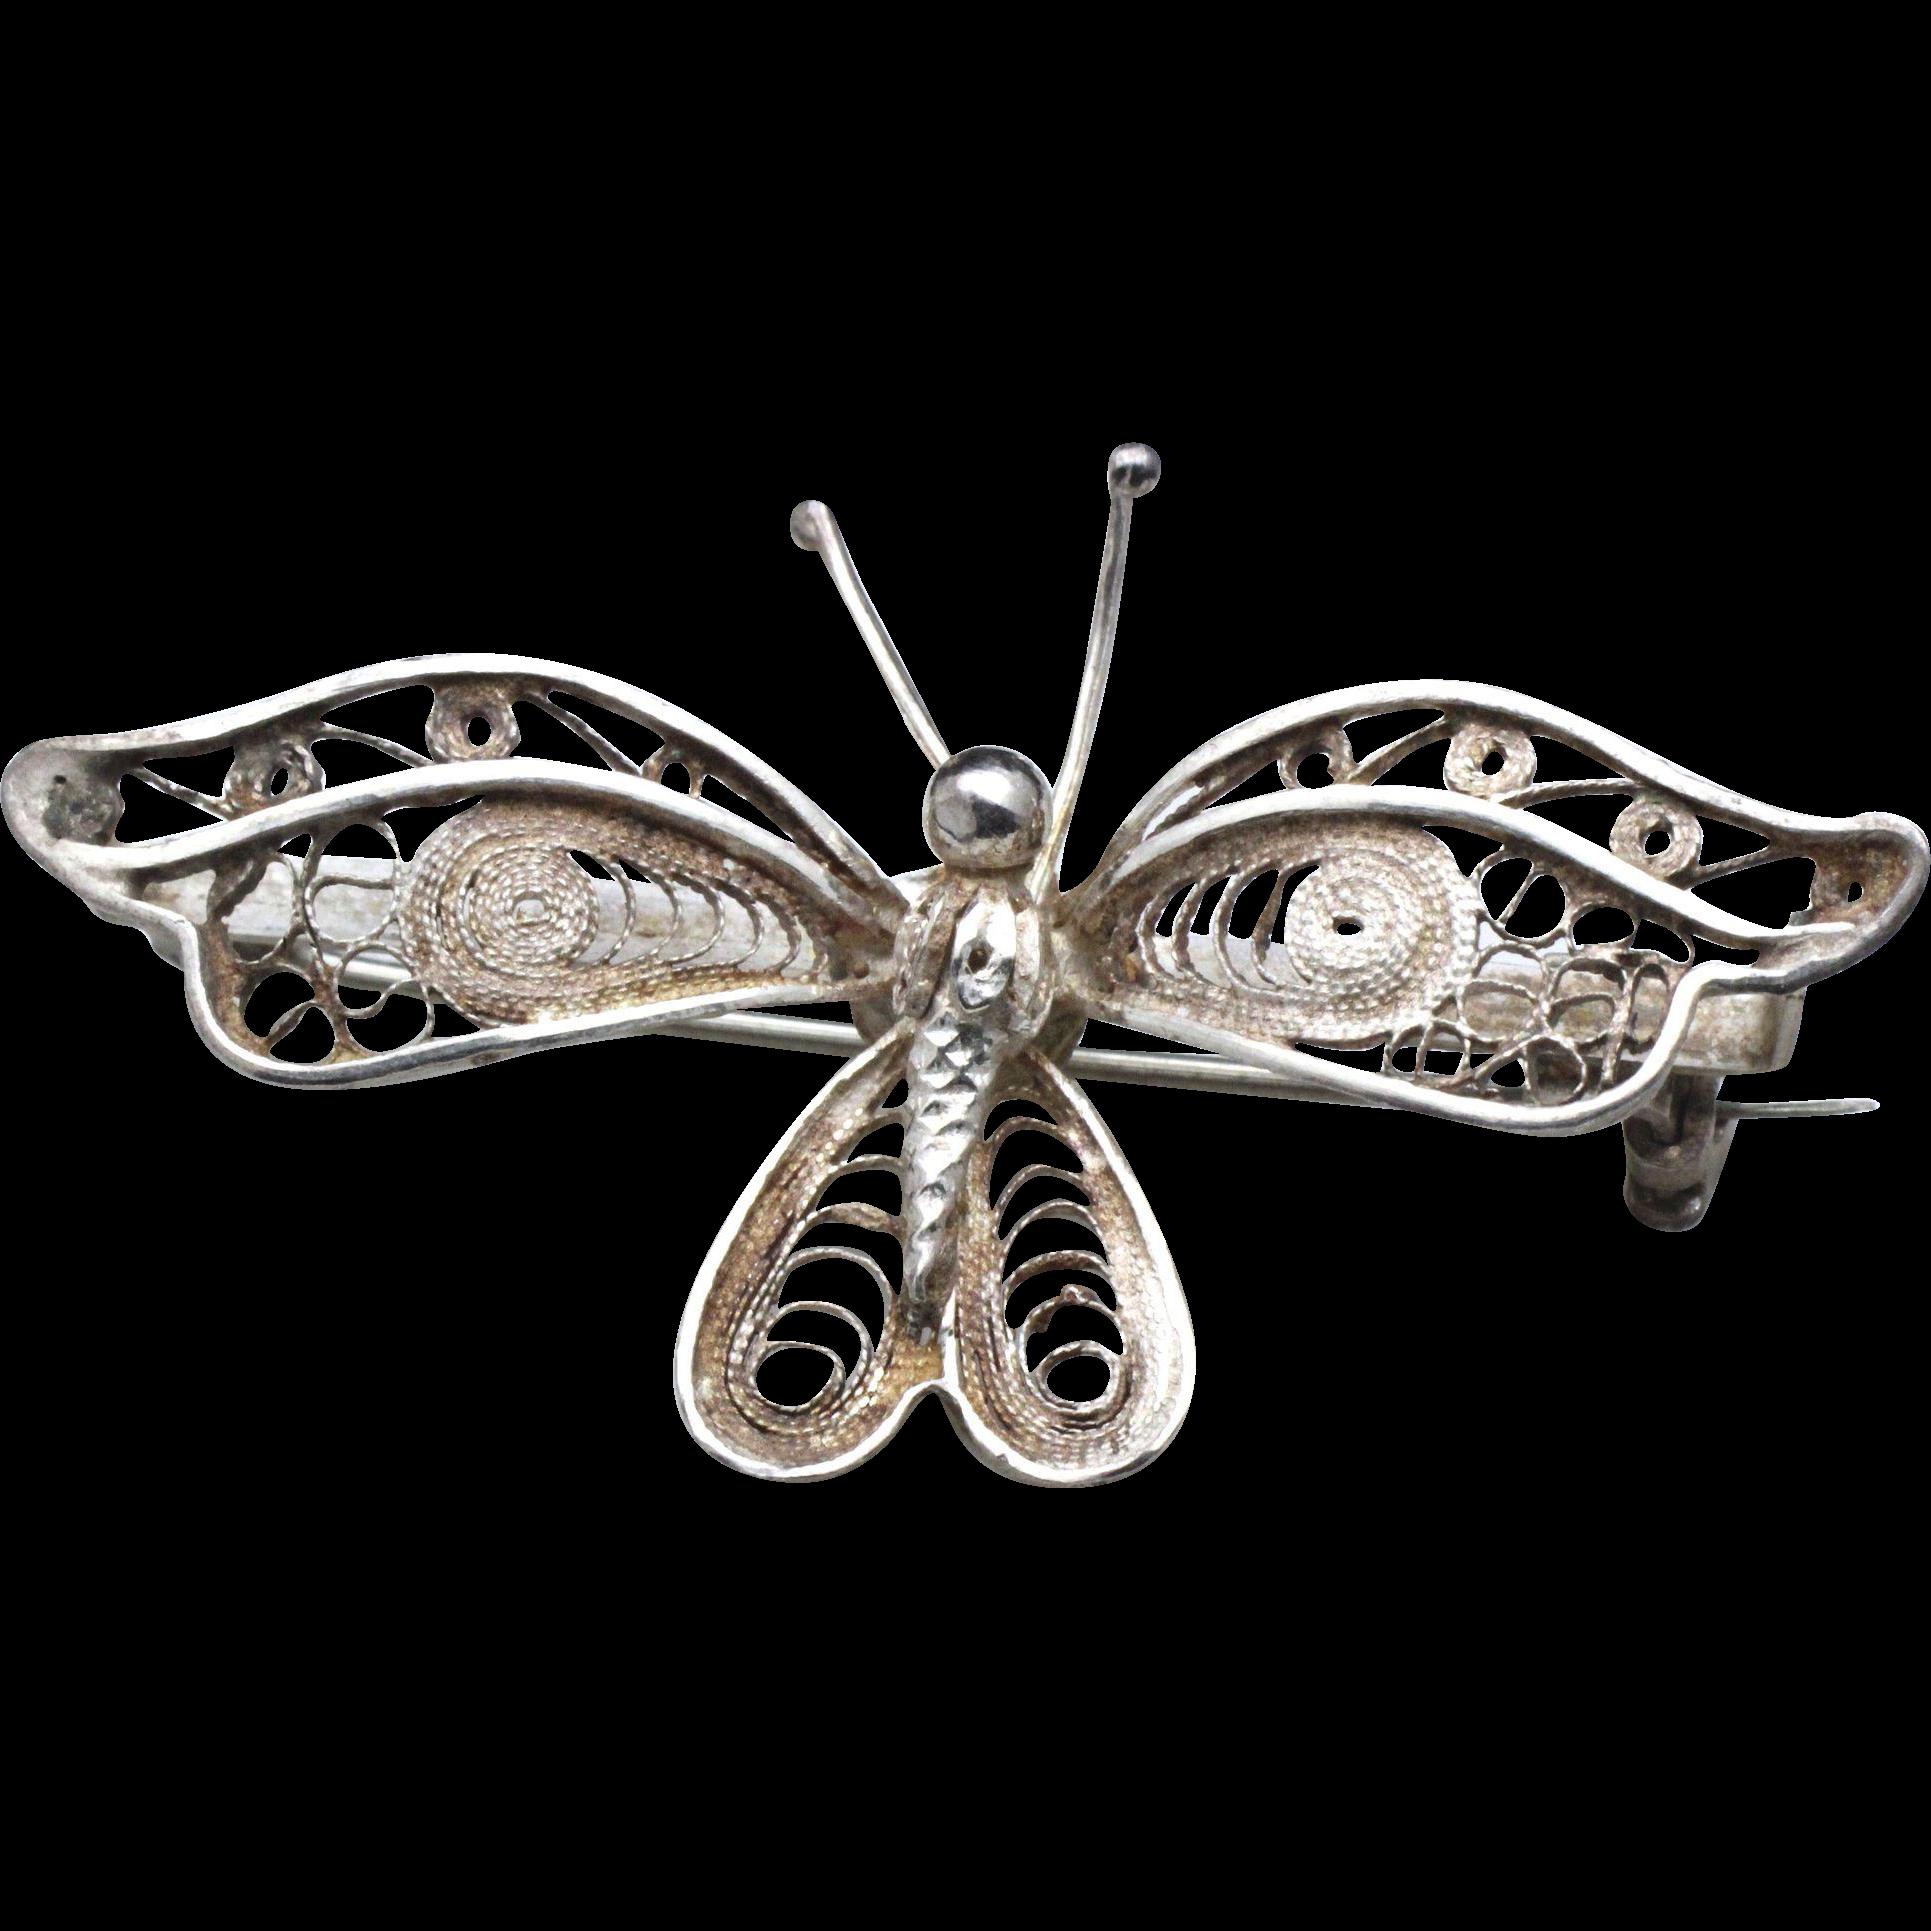 Vintage Sterling Silver Filigree Butterfly Pin Brooch